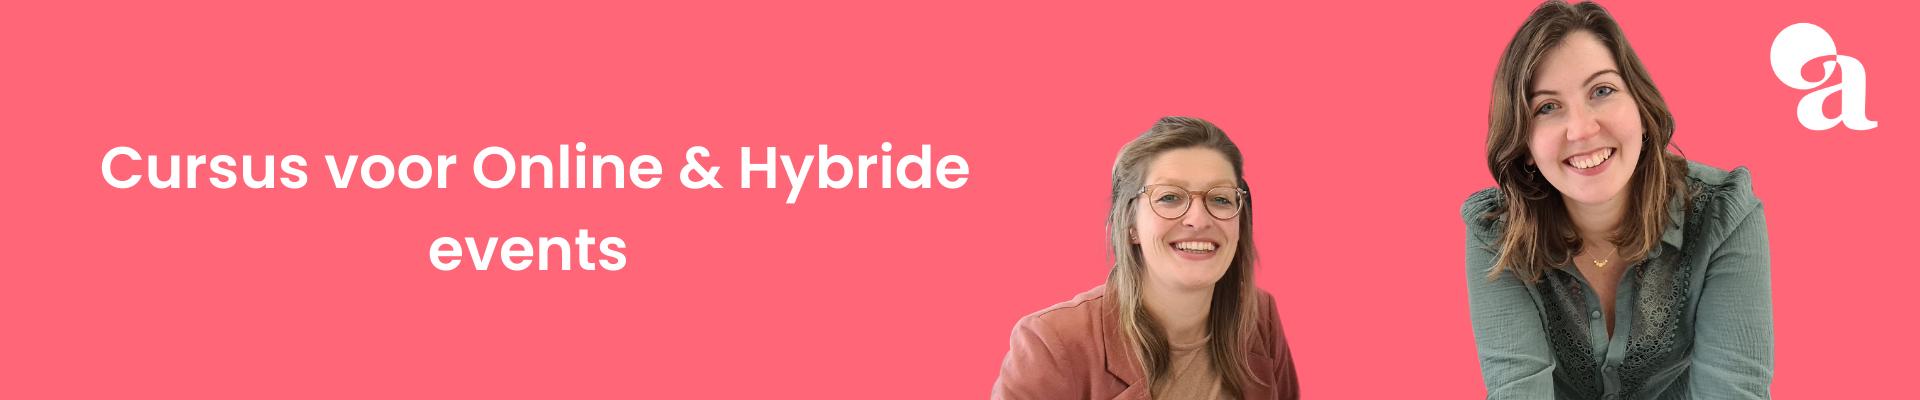 Cursus voor Online & Hybride events (november groep)